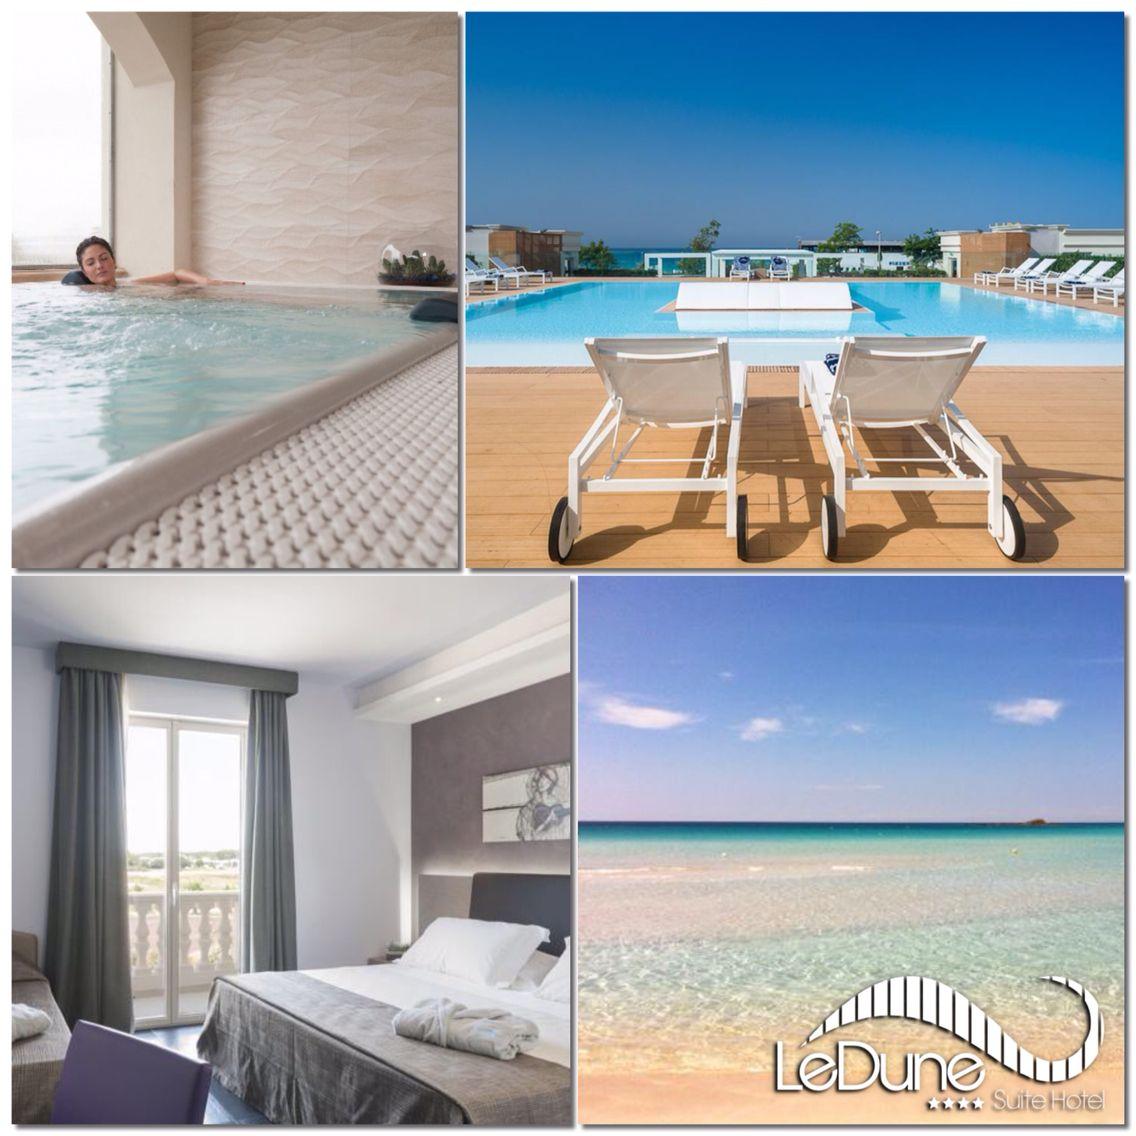 Le Dune Suite Hotel Salento, Puglia italia, Italia